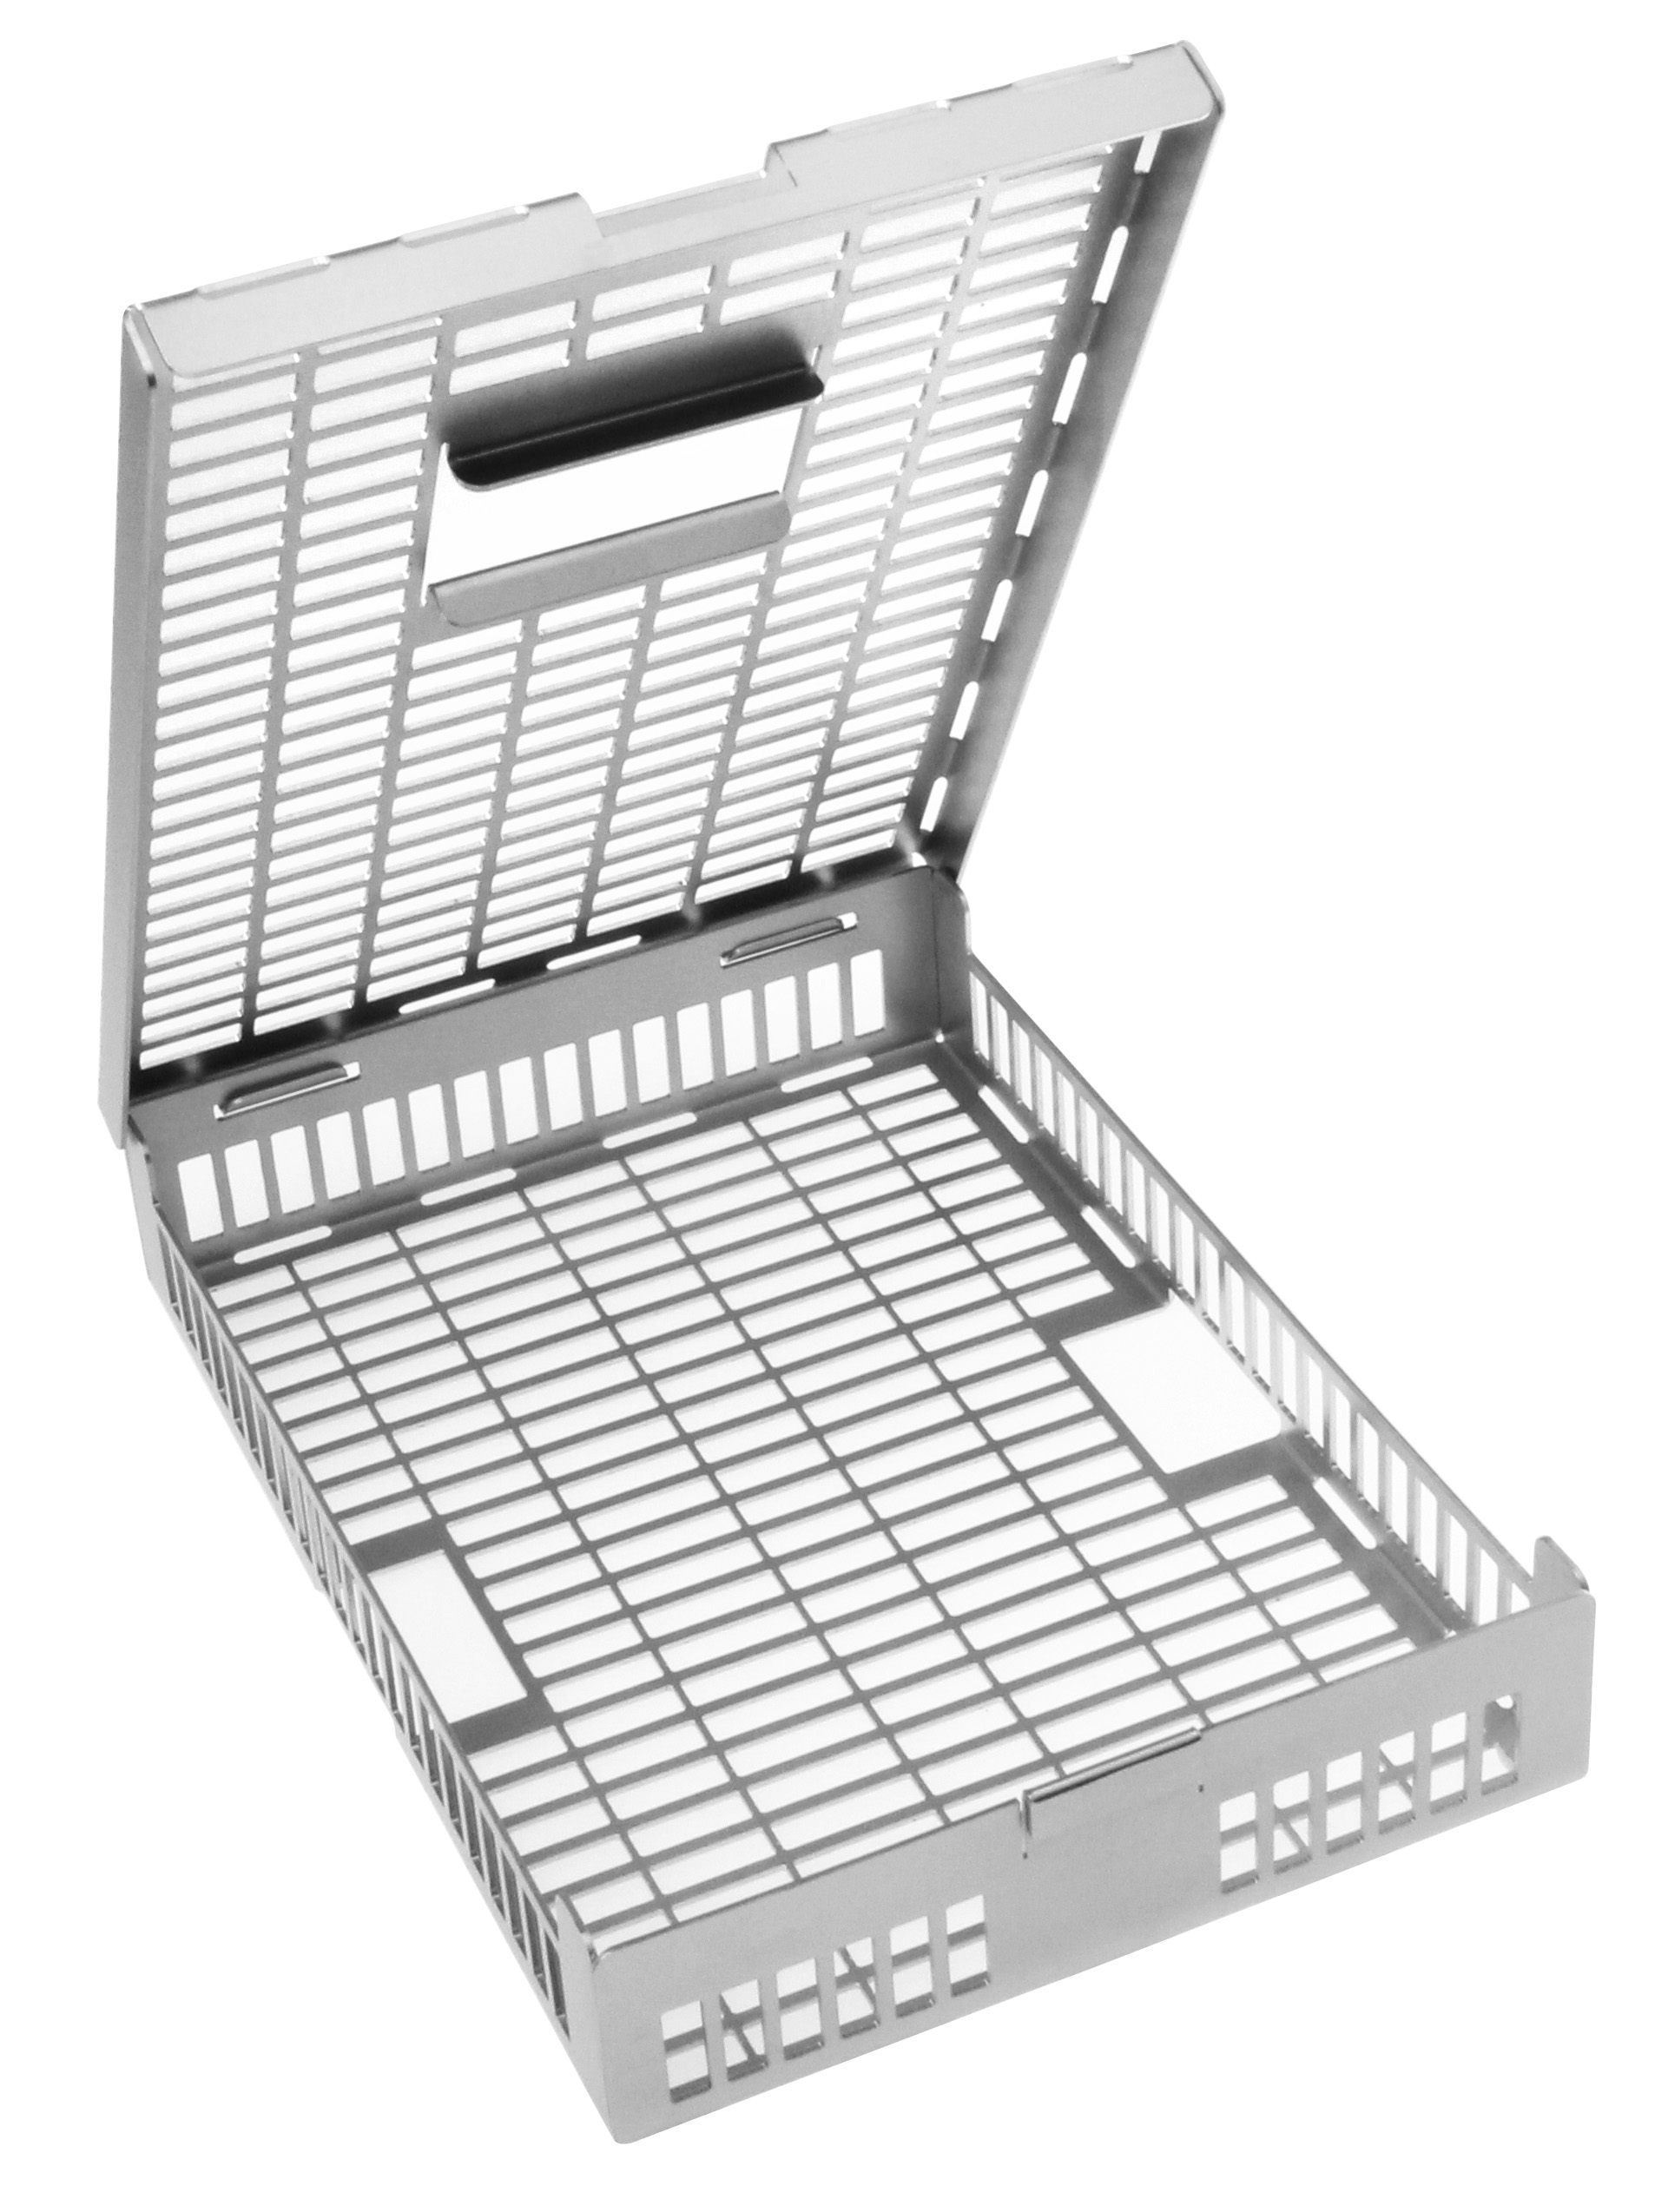 BASIC Wash Tray  (180x130x35mm)